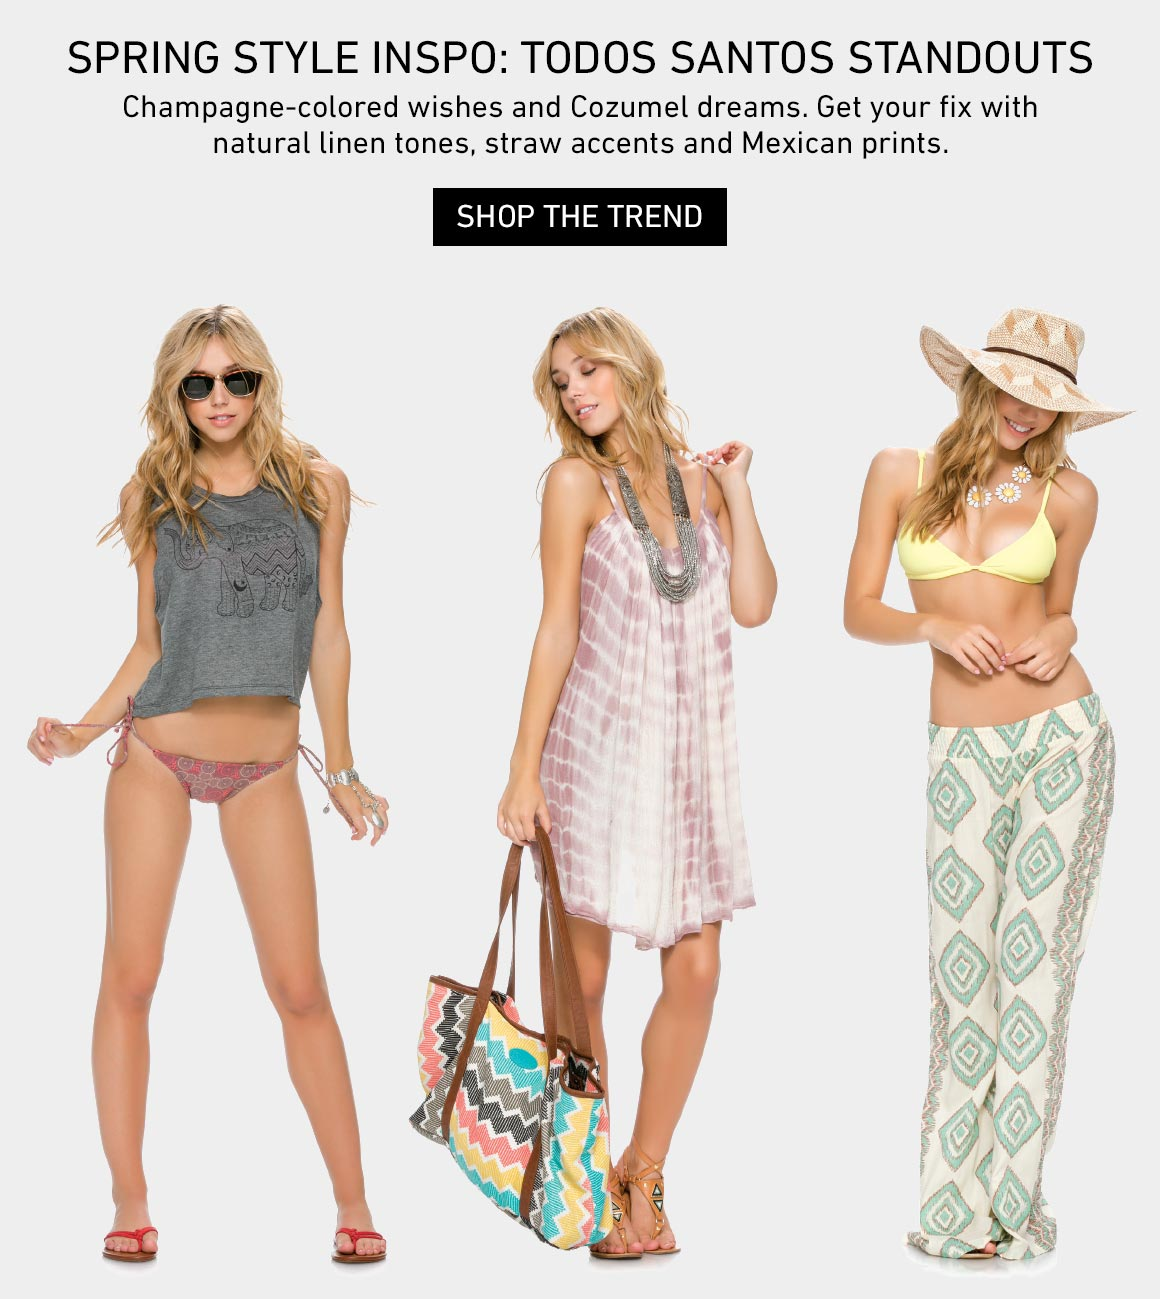 Todos Santos Standous: Shop The New Spring Trend